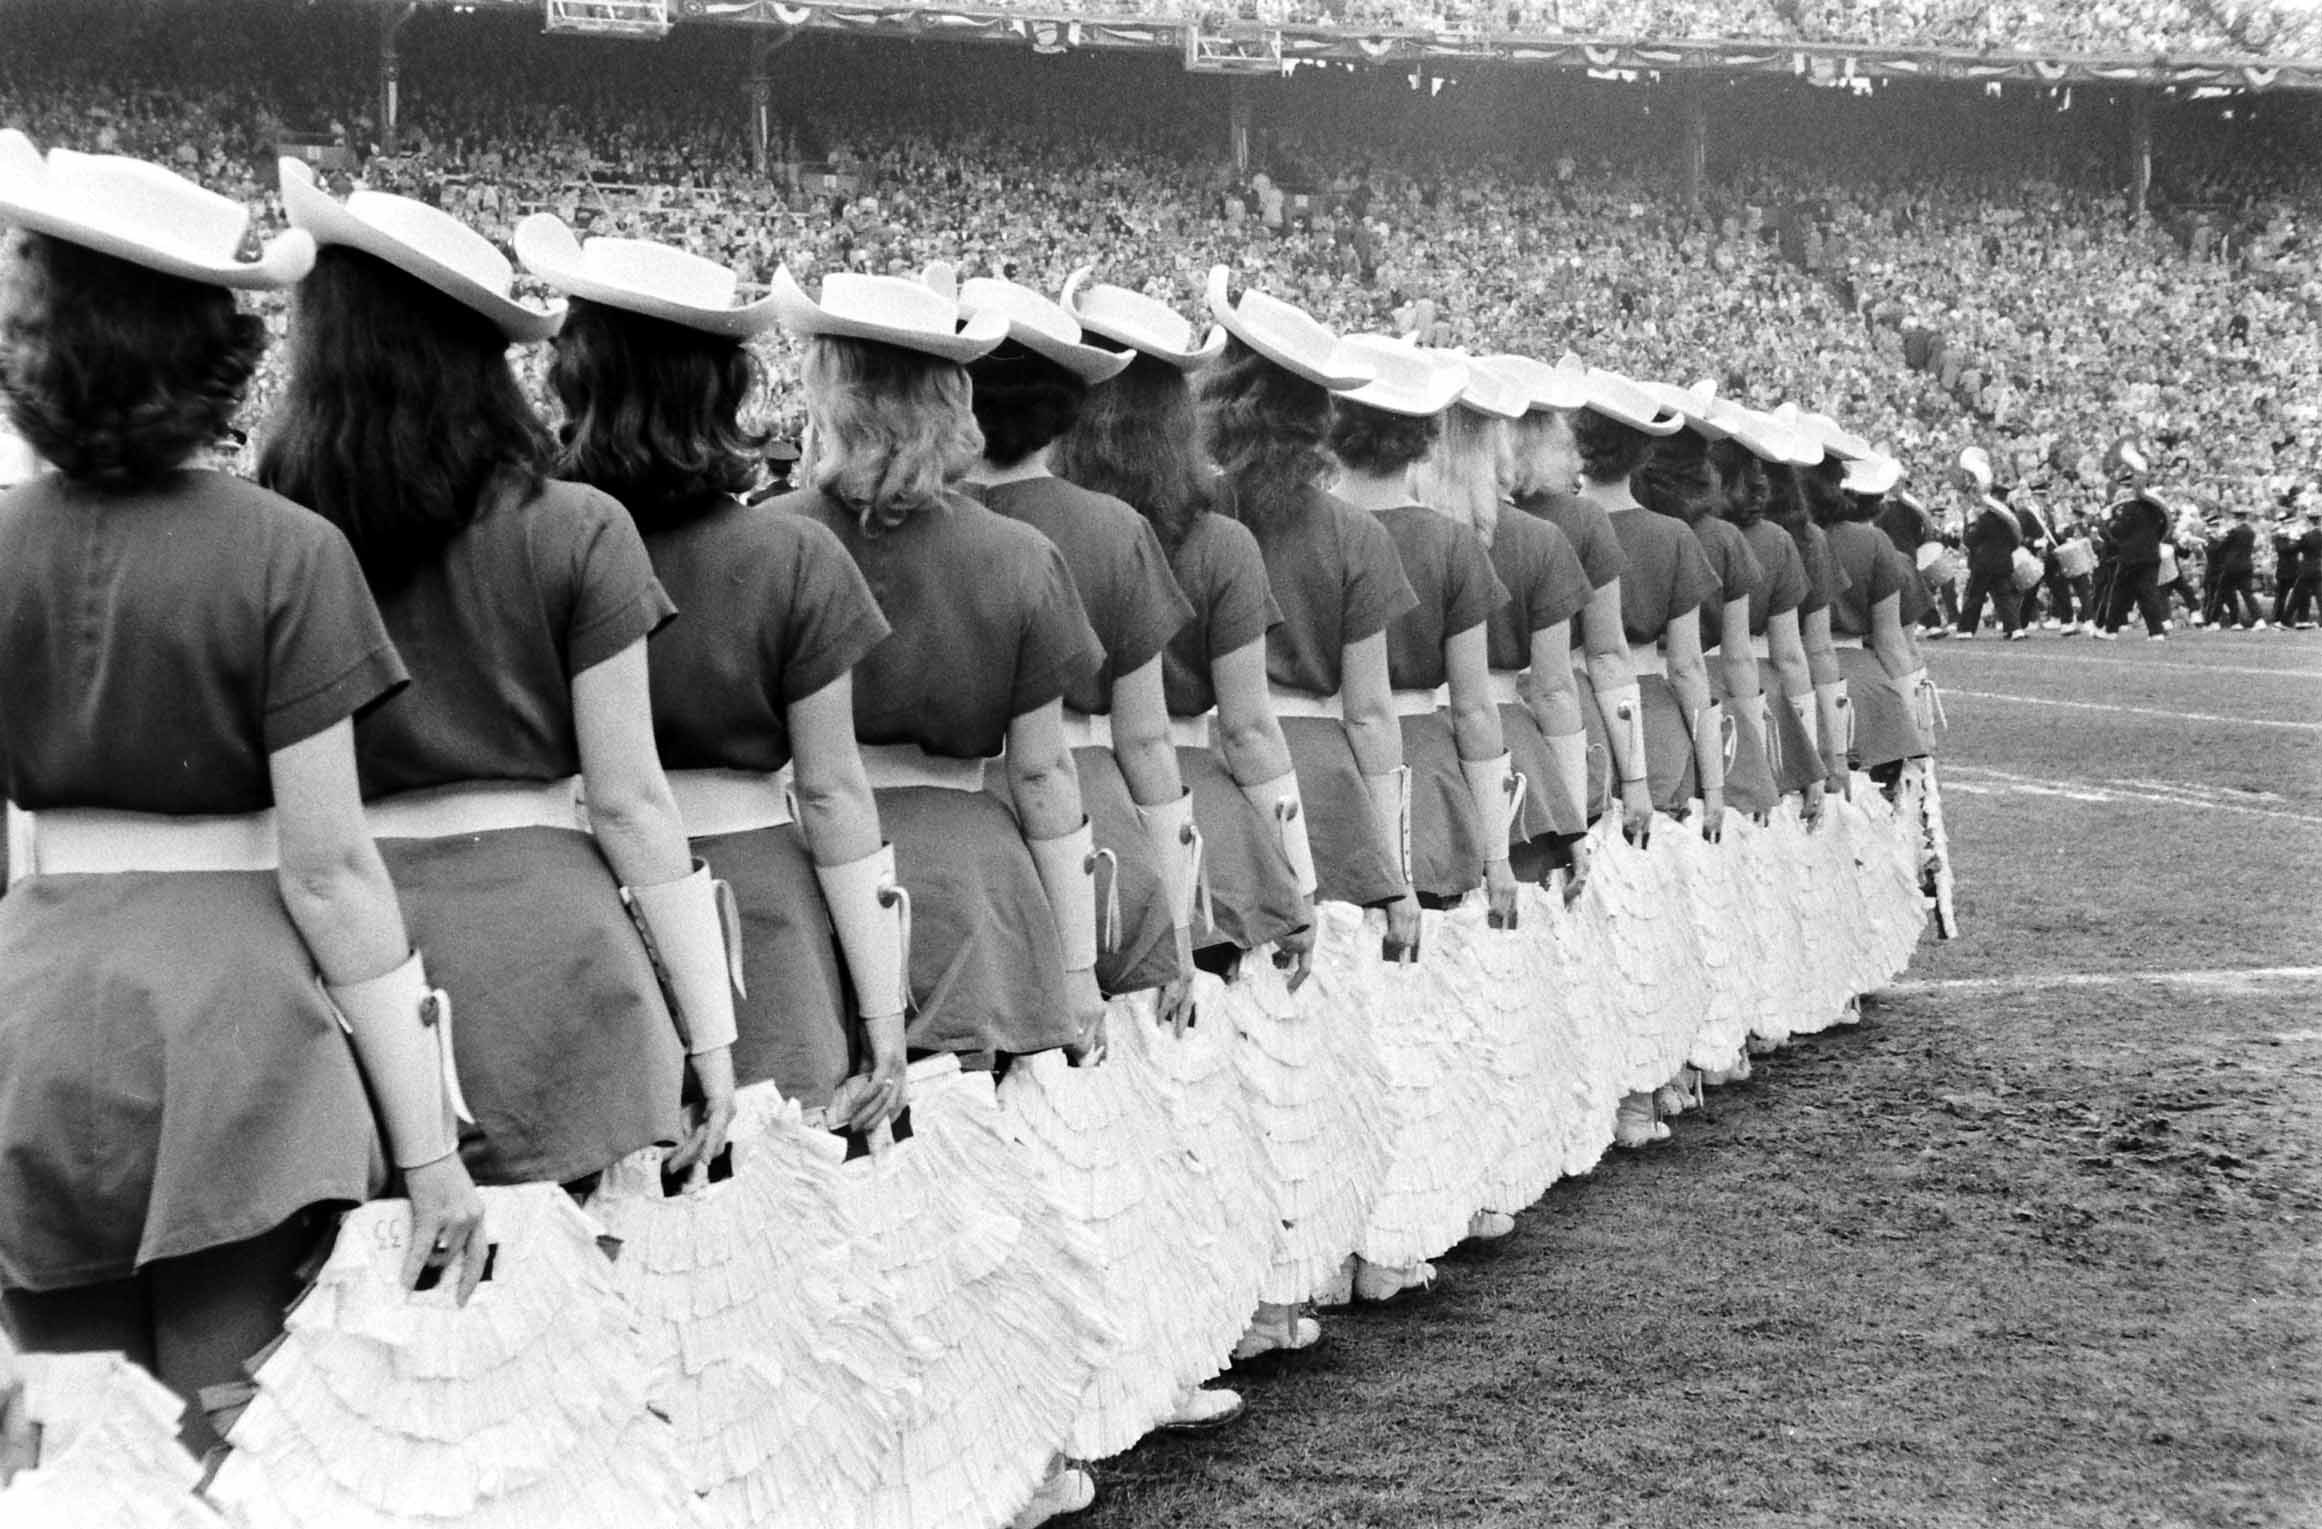 Cotton Bowl cheerleaders, 1960.